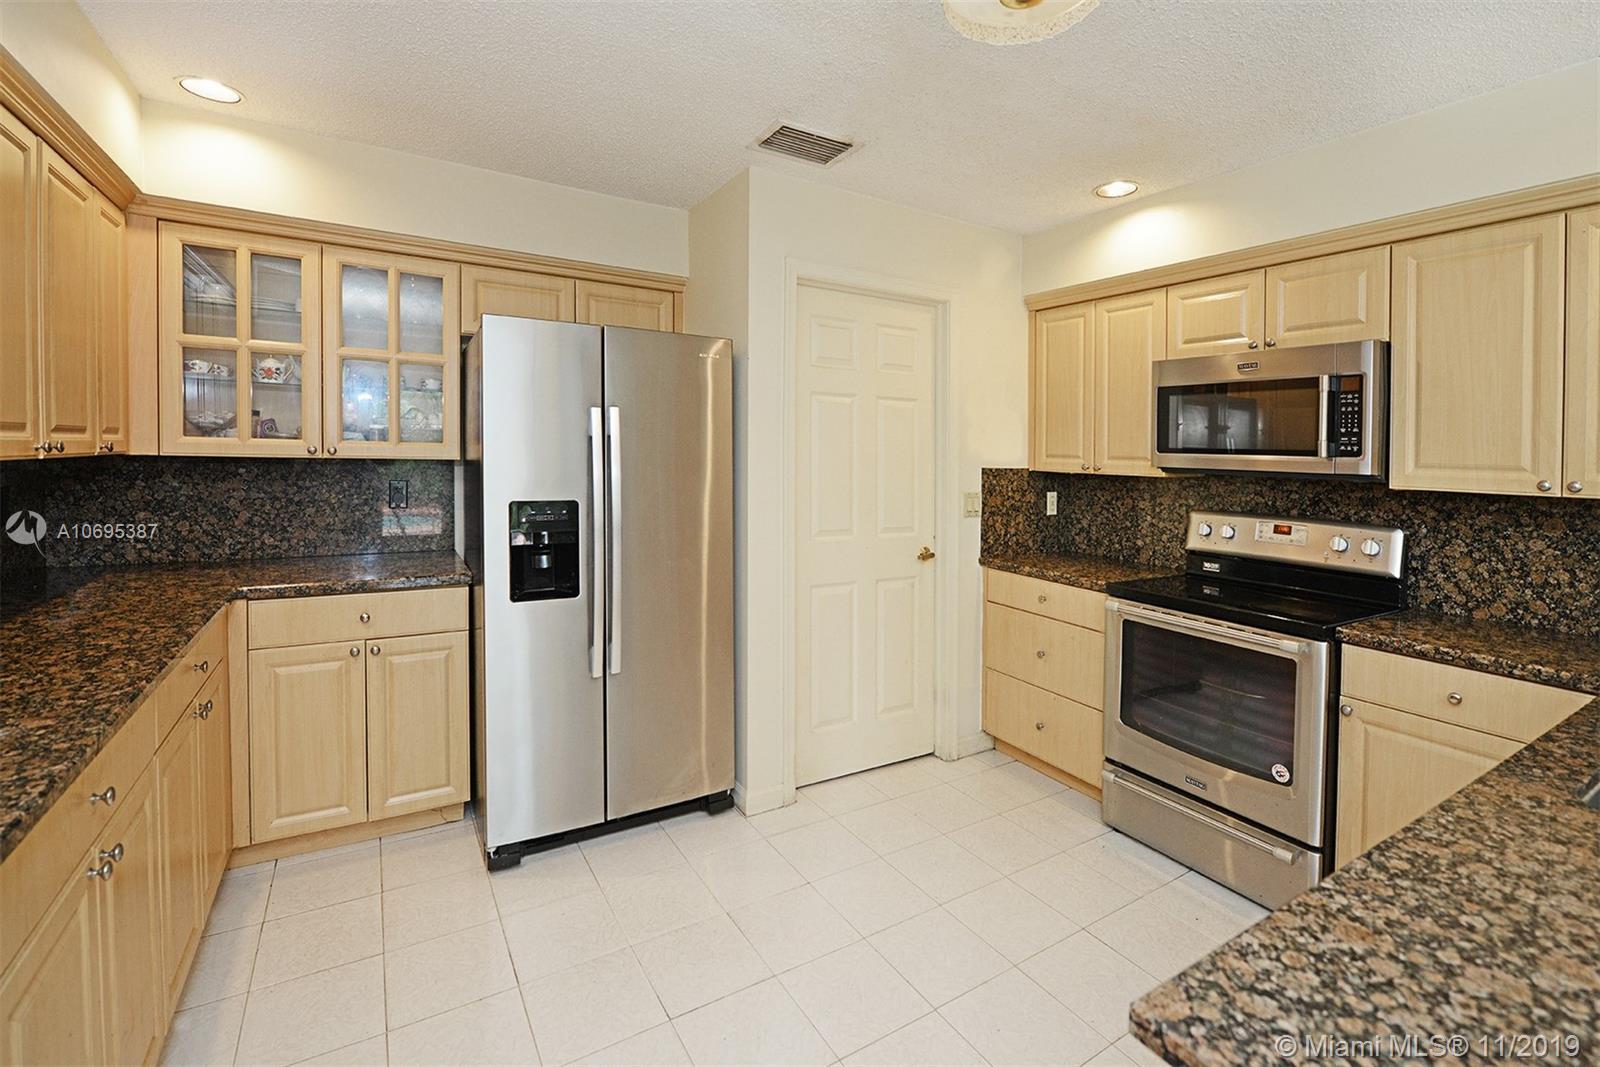 799 Villa Portofino Cir 799, Deerfield Beach, FL 33442